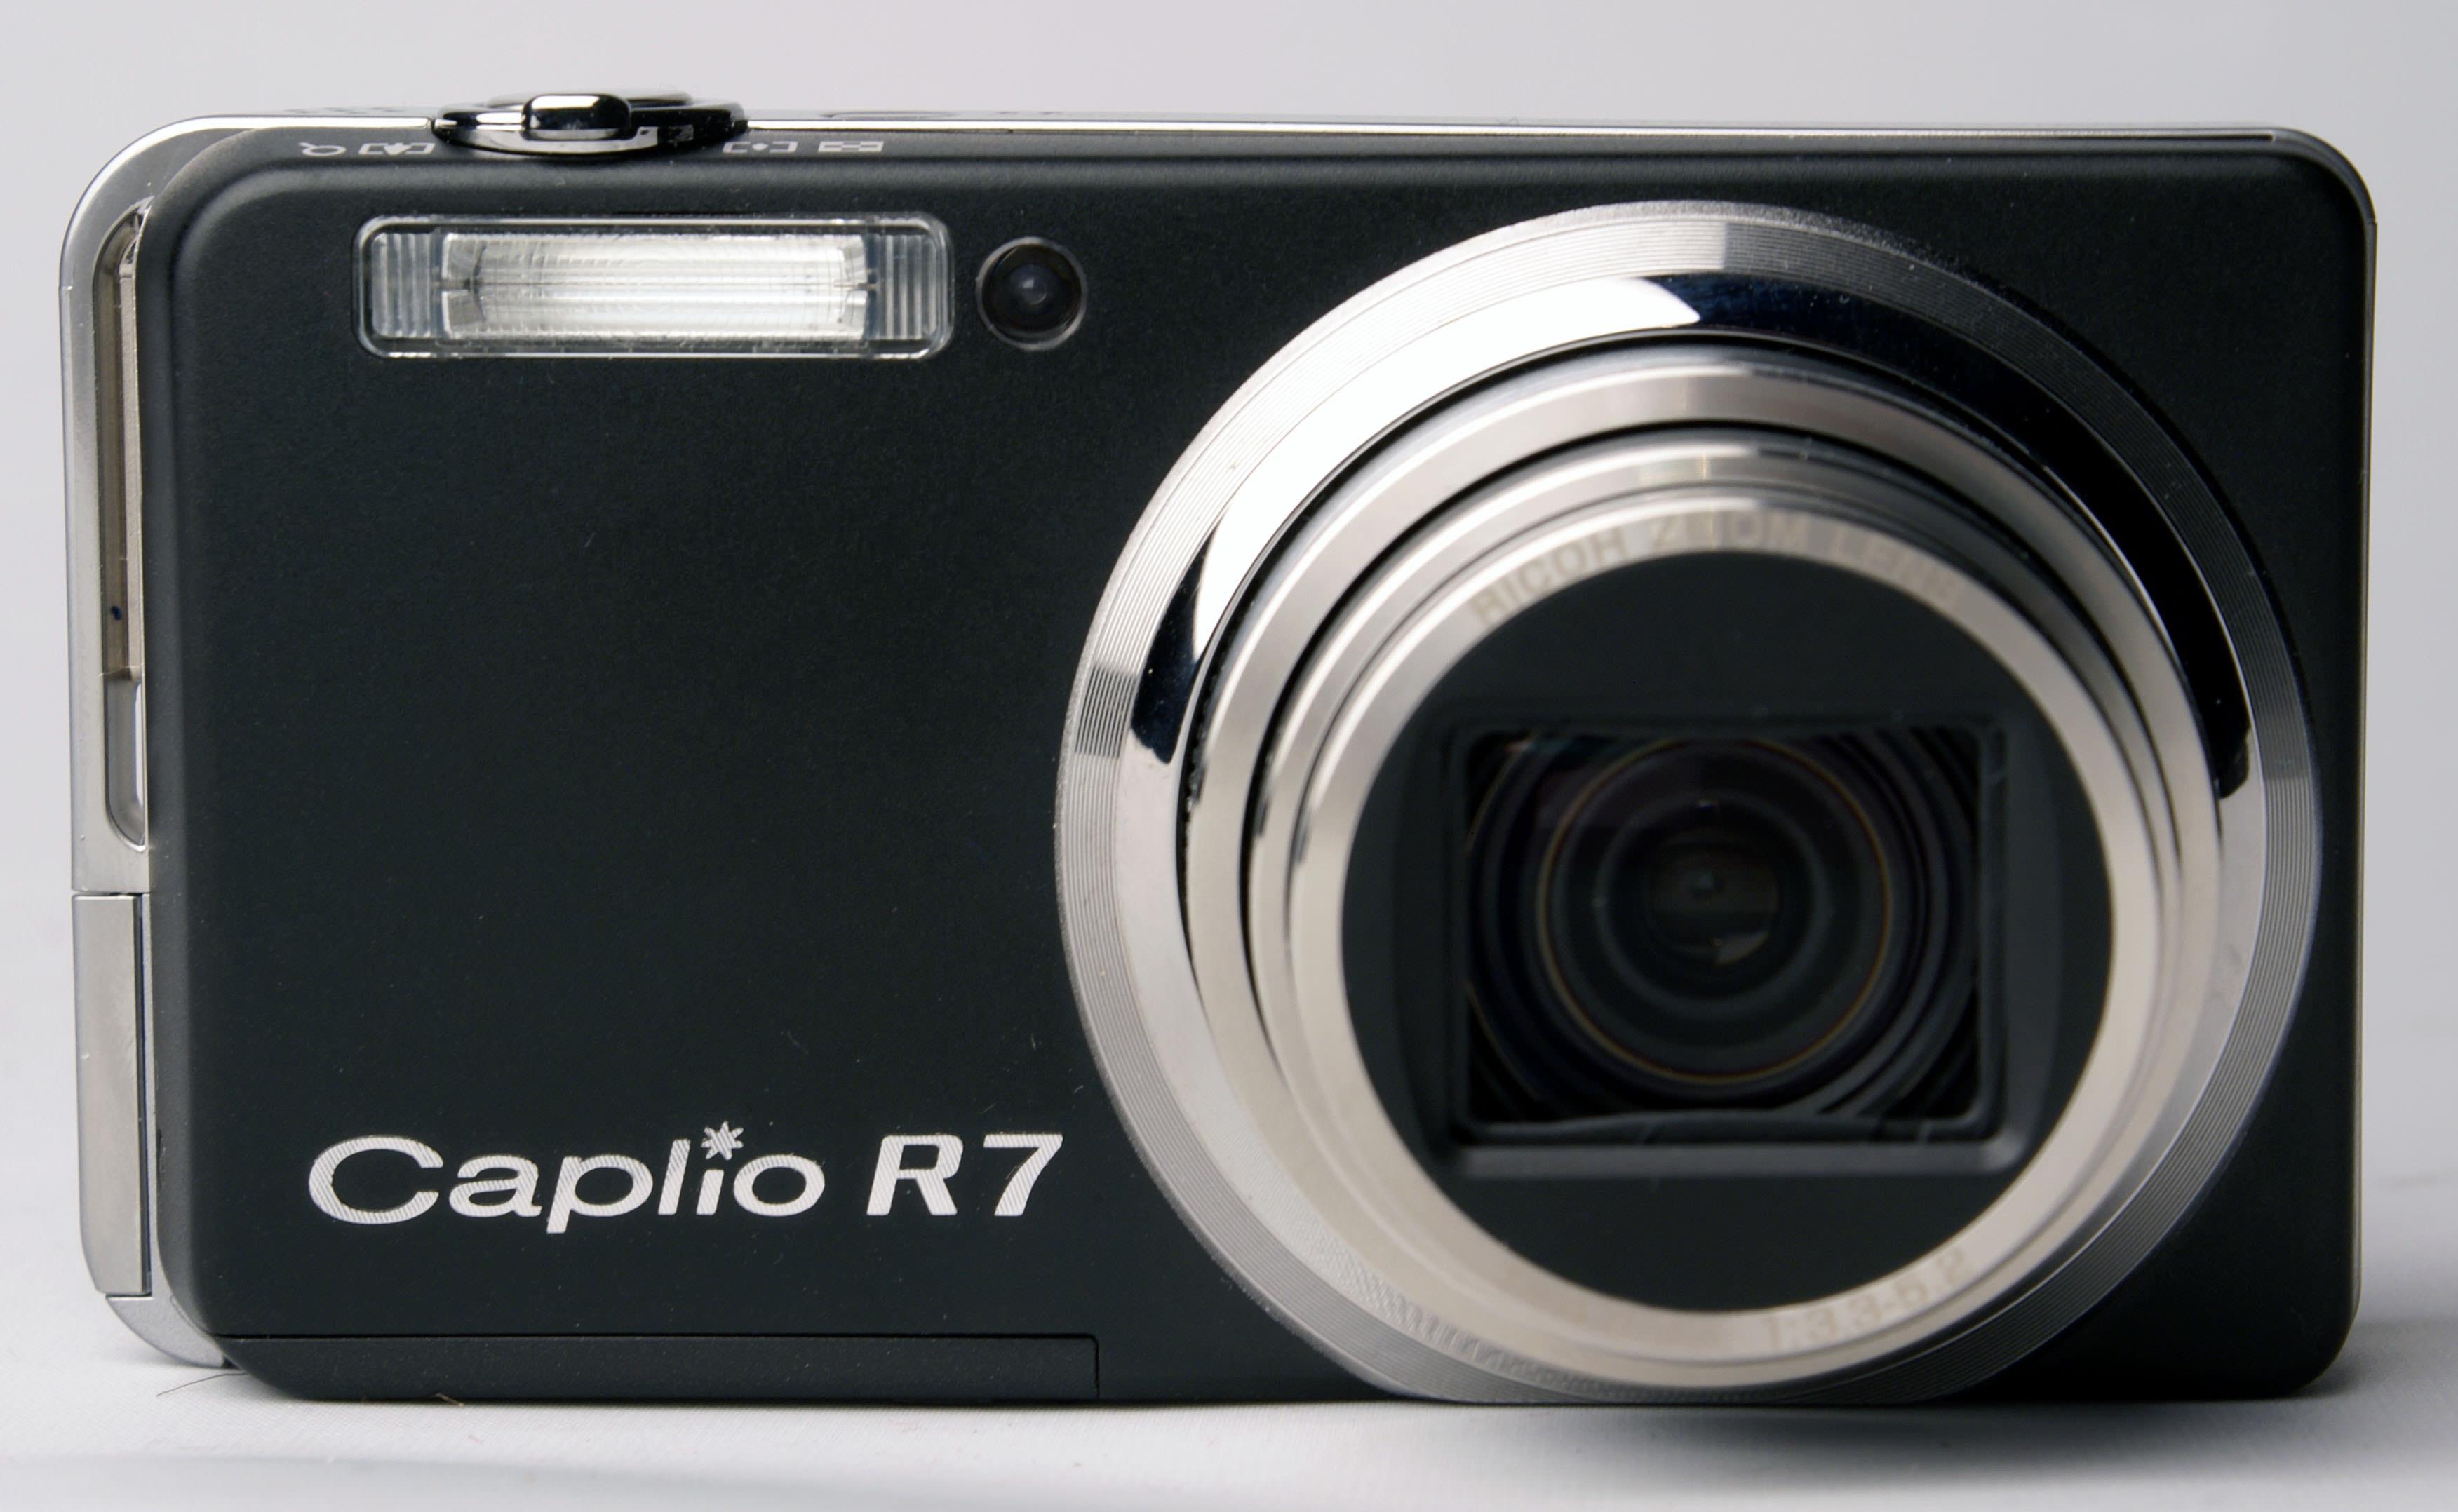 ricoh caplio r7 Beste Bilder: